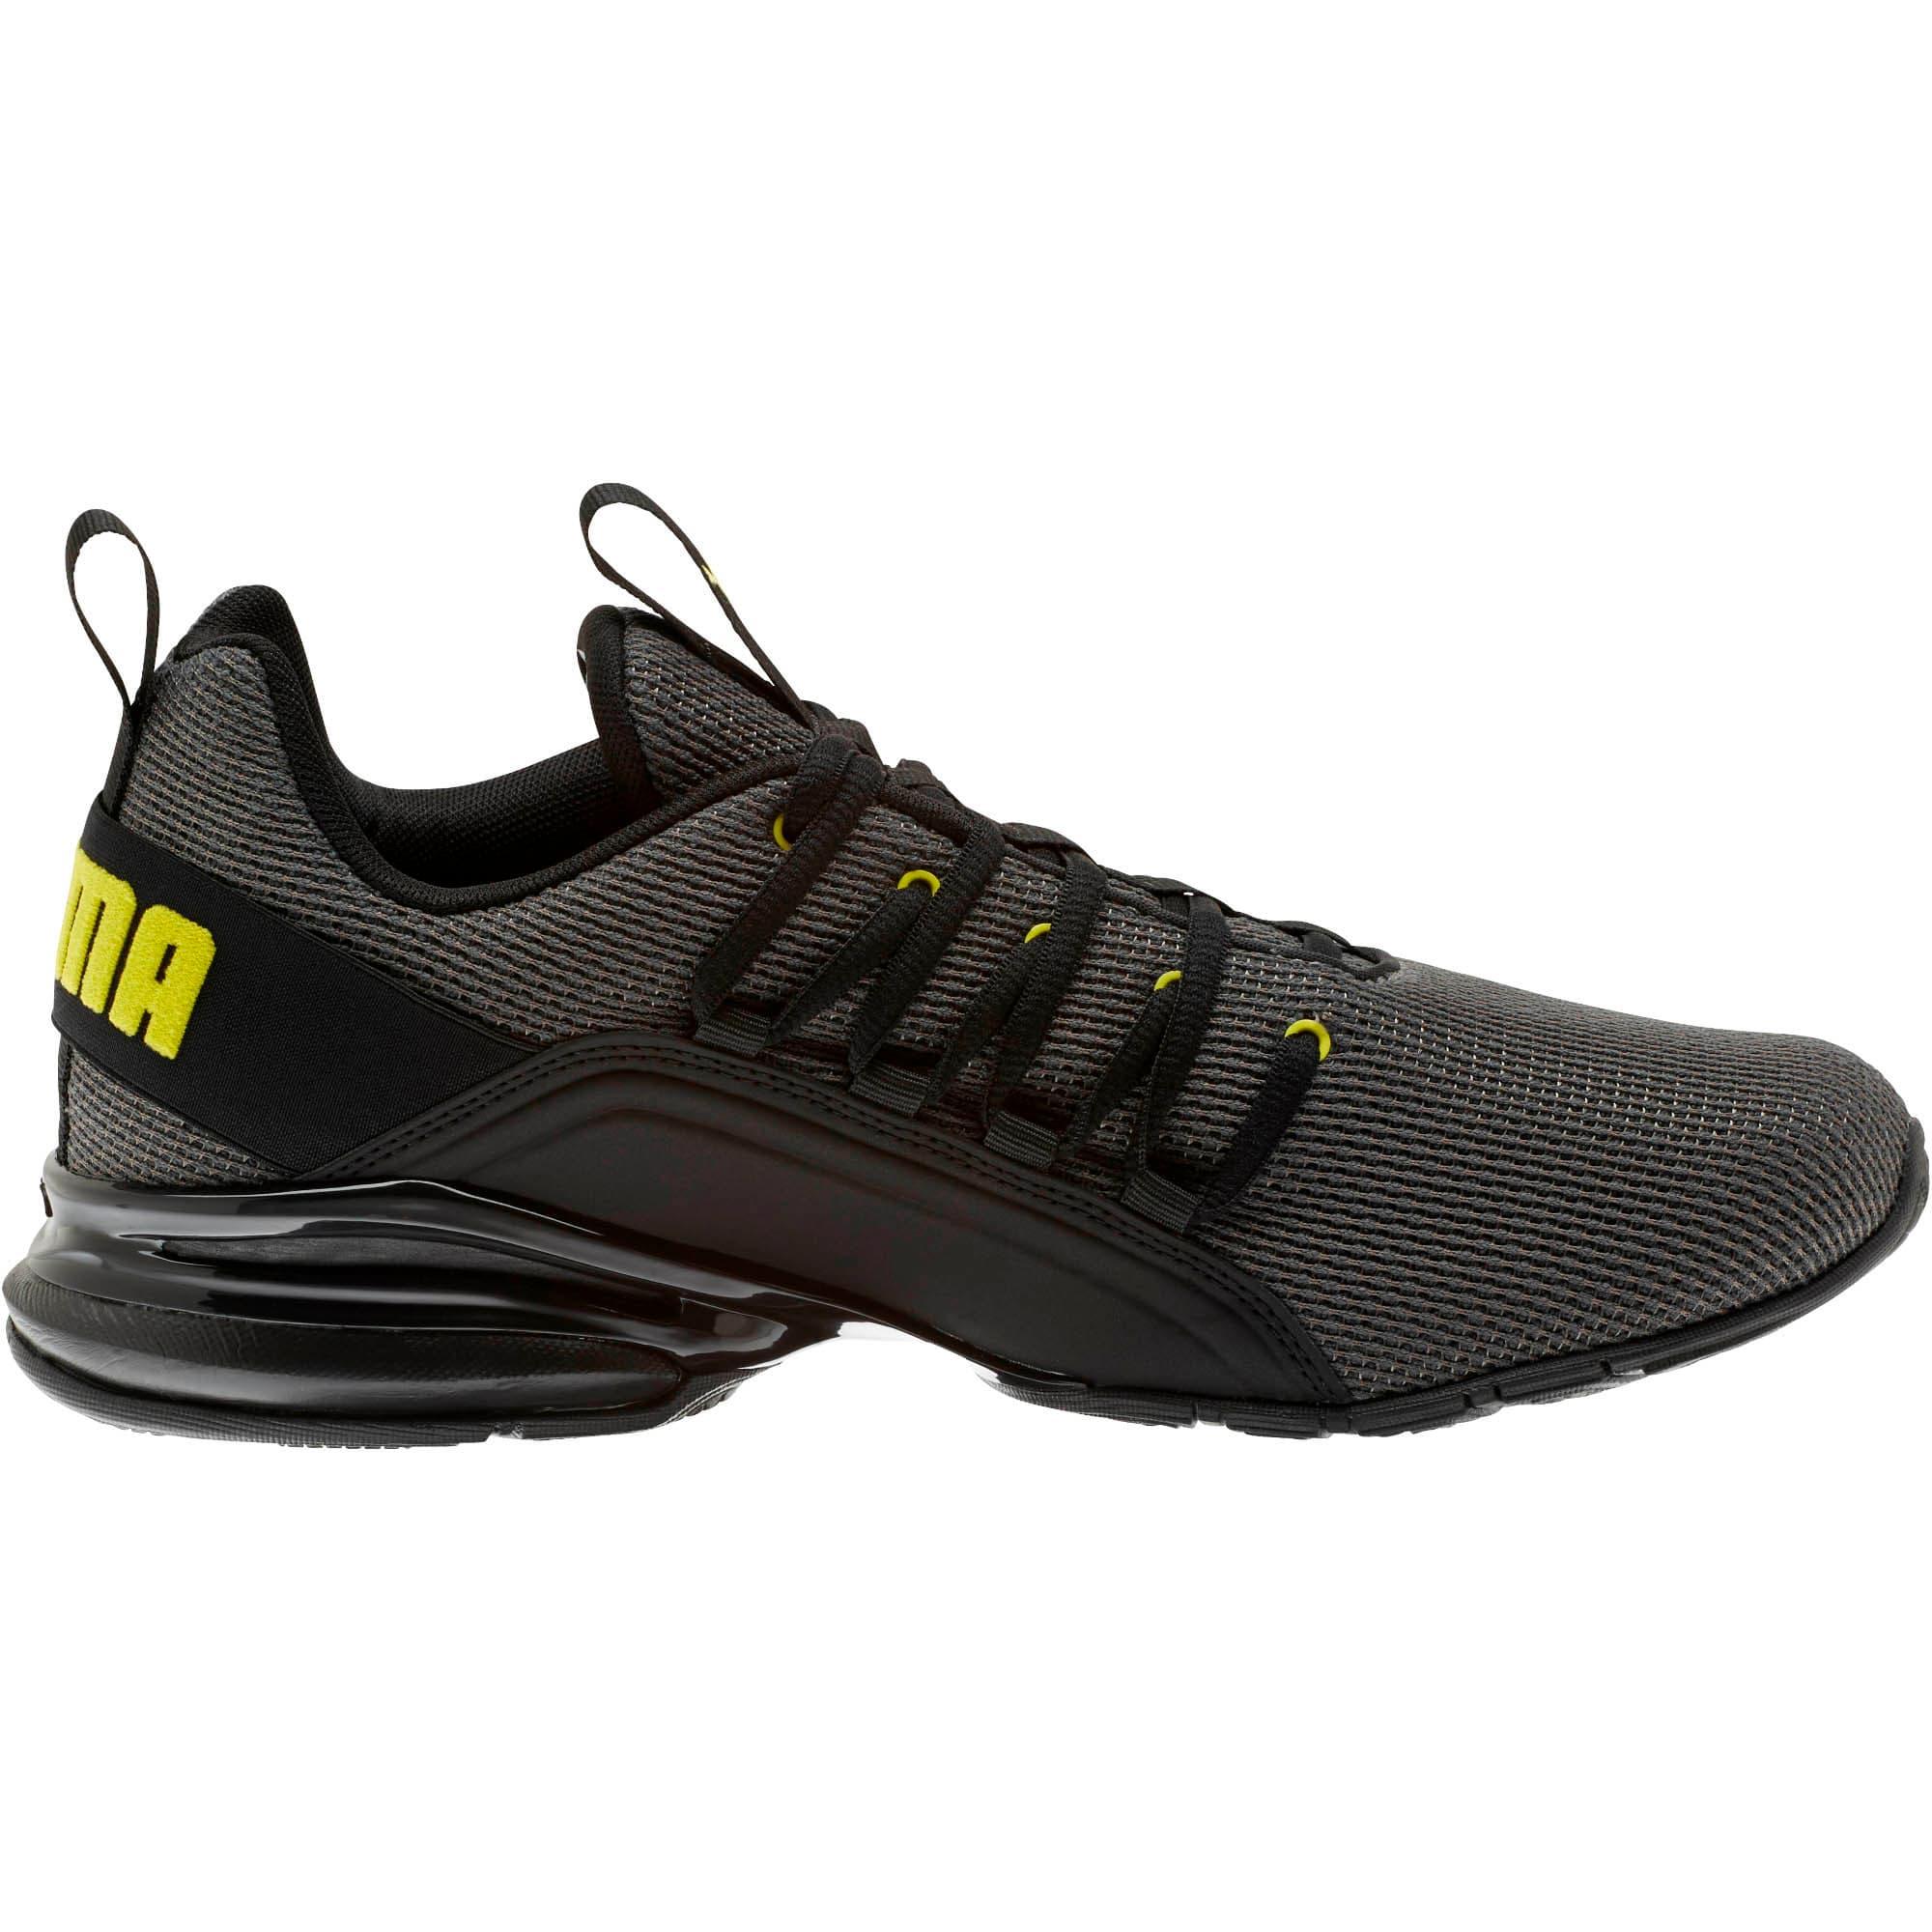 Thumbnail 4 of Axelion Mesh Men's Training Shoes, Charcoal Gray-Blazing Yellow, medium